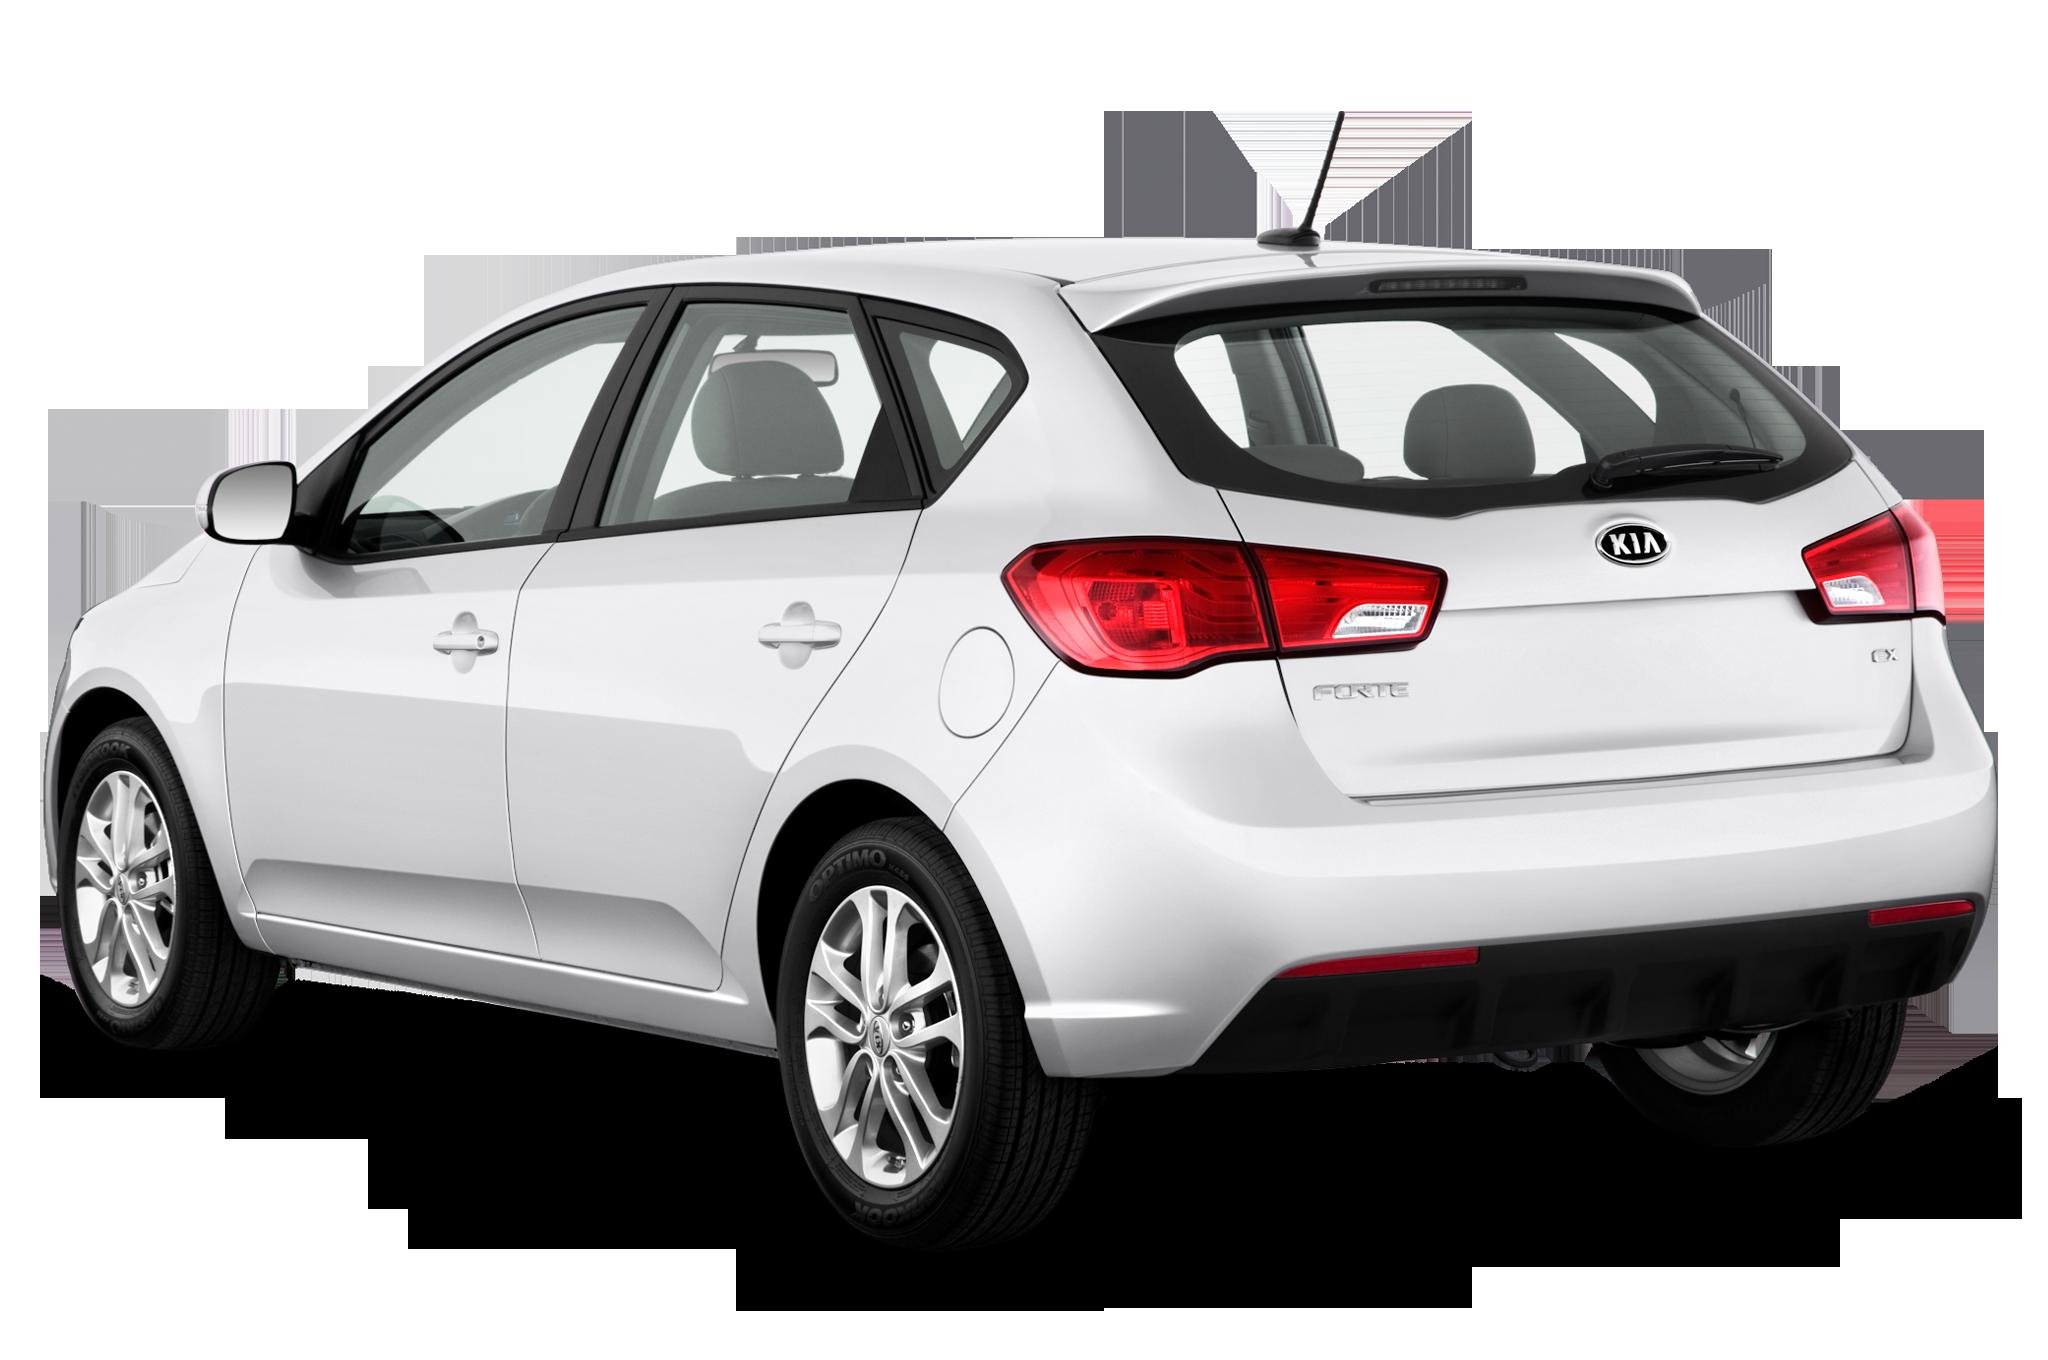 Kia Forte Hatchback >> Kia Forte Ex At Hatchback 2012 International Price Overview